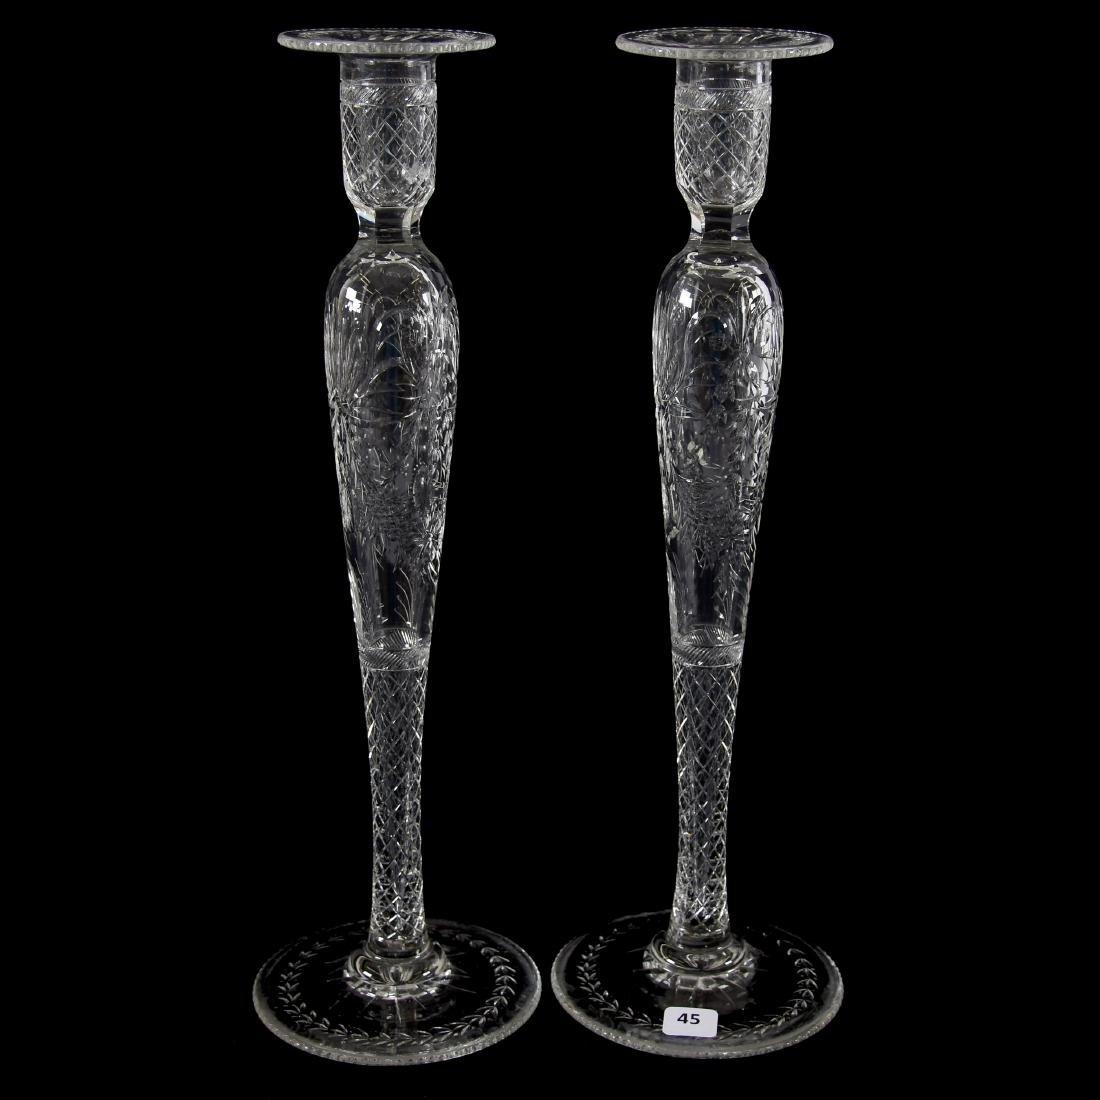 Pair Candlesticks, Engraved Design